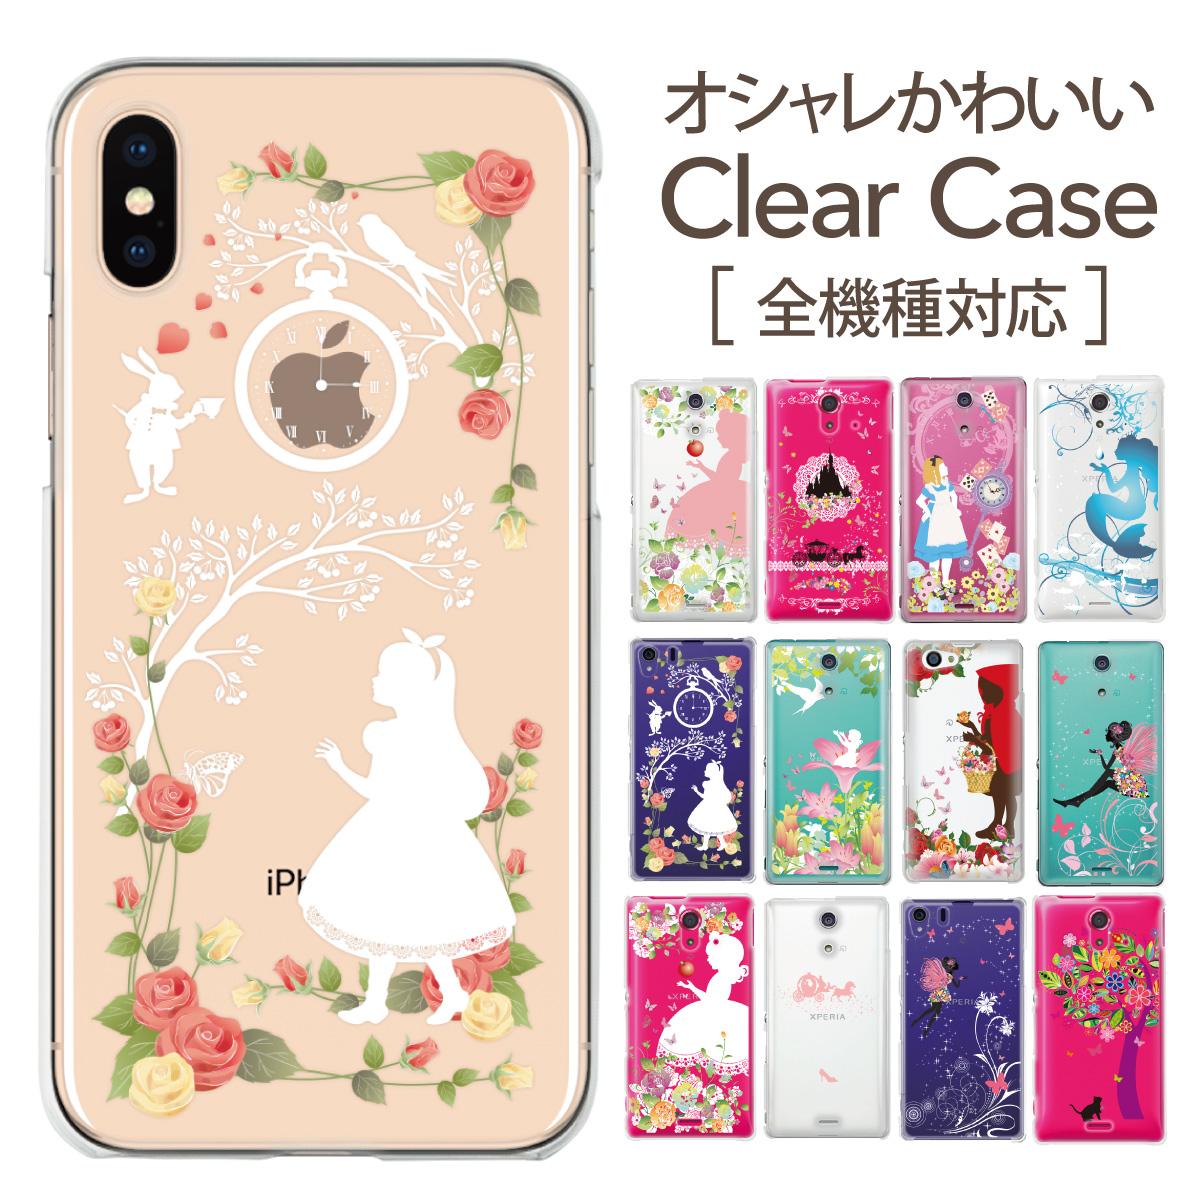 iPhoneSE(iPhone5/5s)のおしゃれでかわいいスマホケースを教えて!